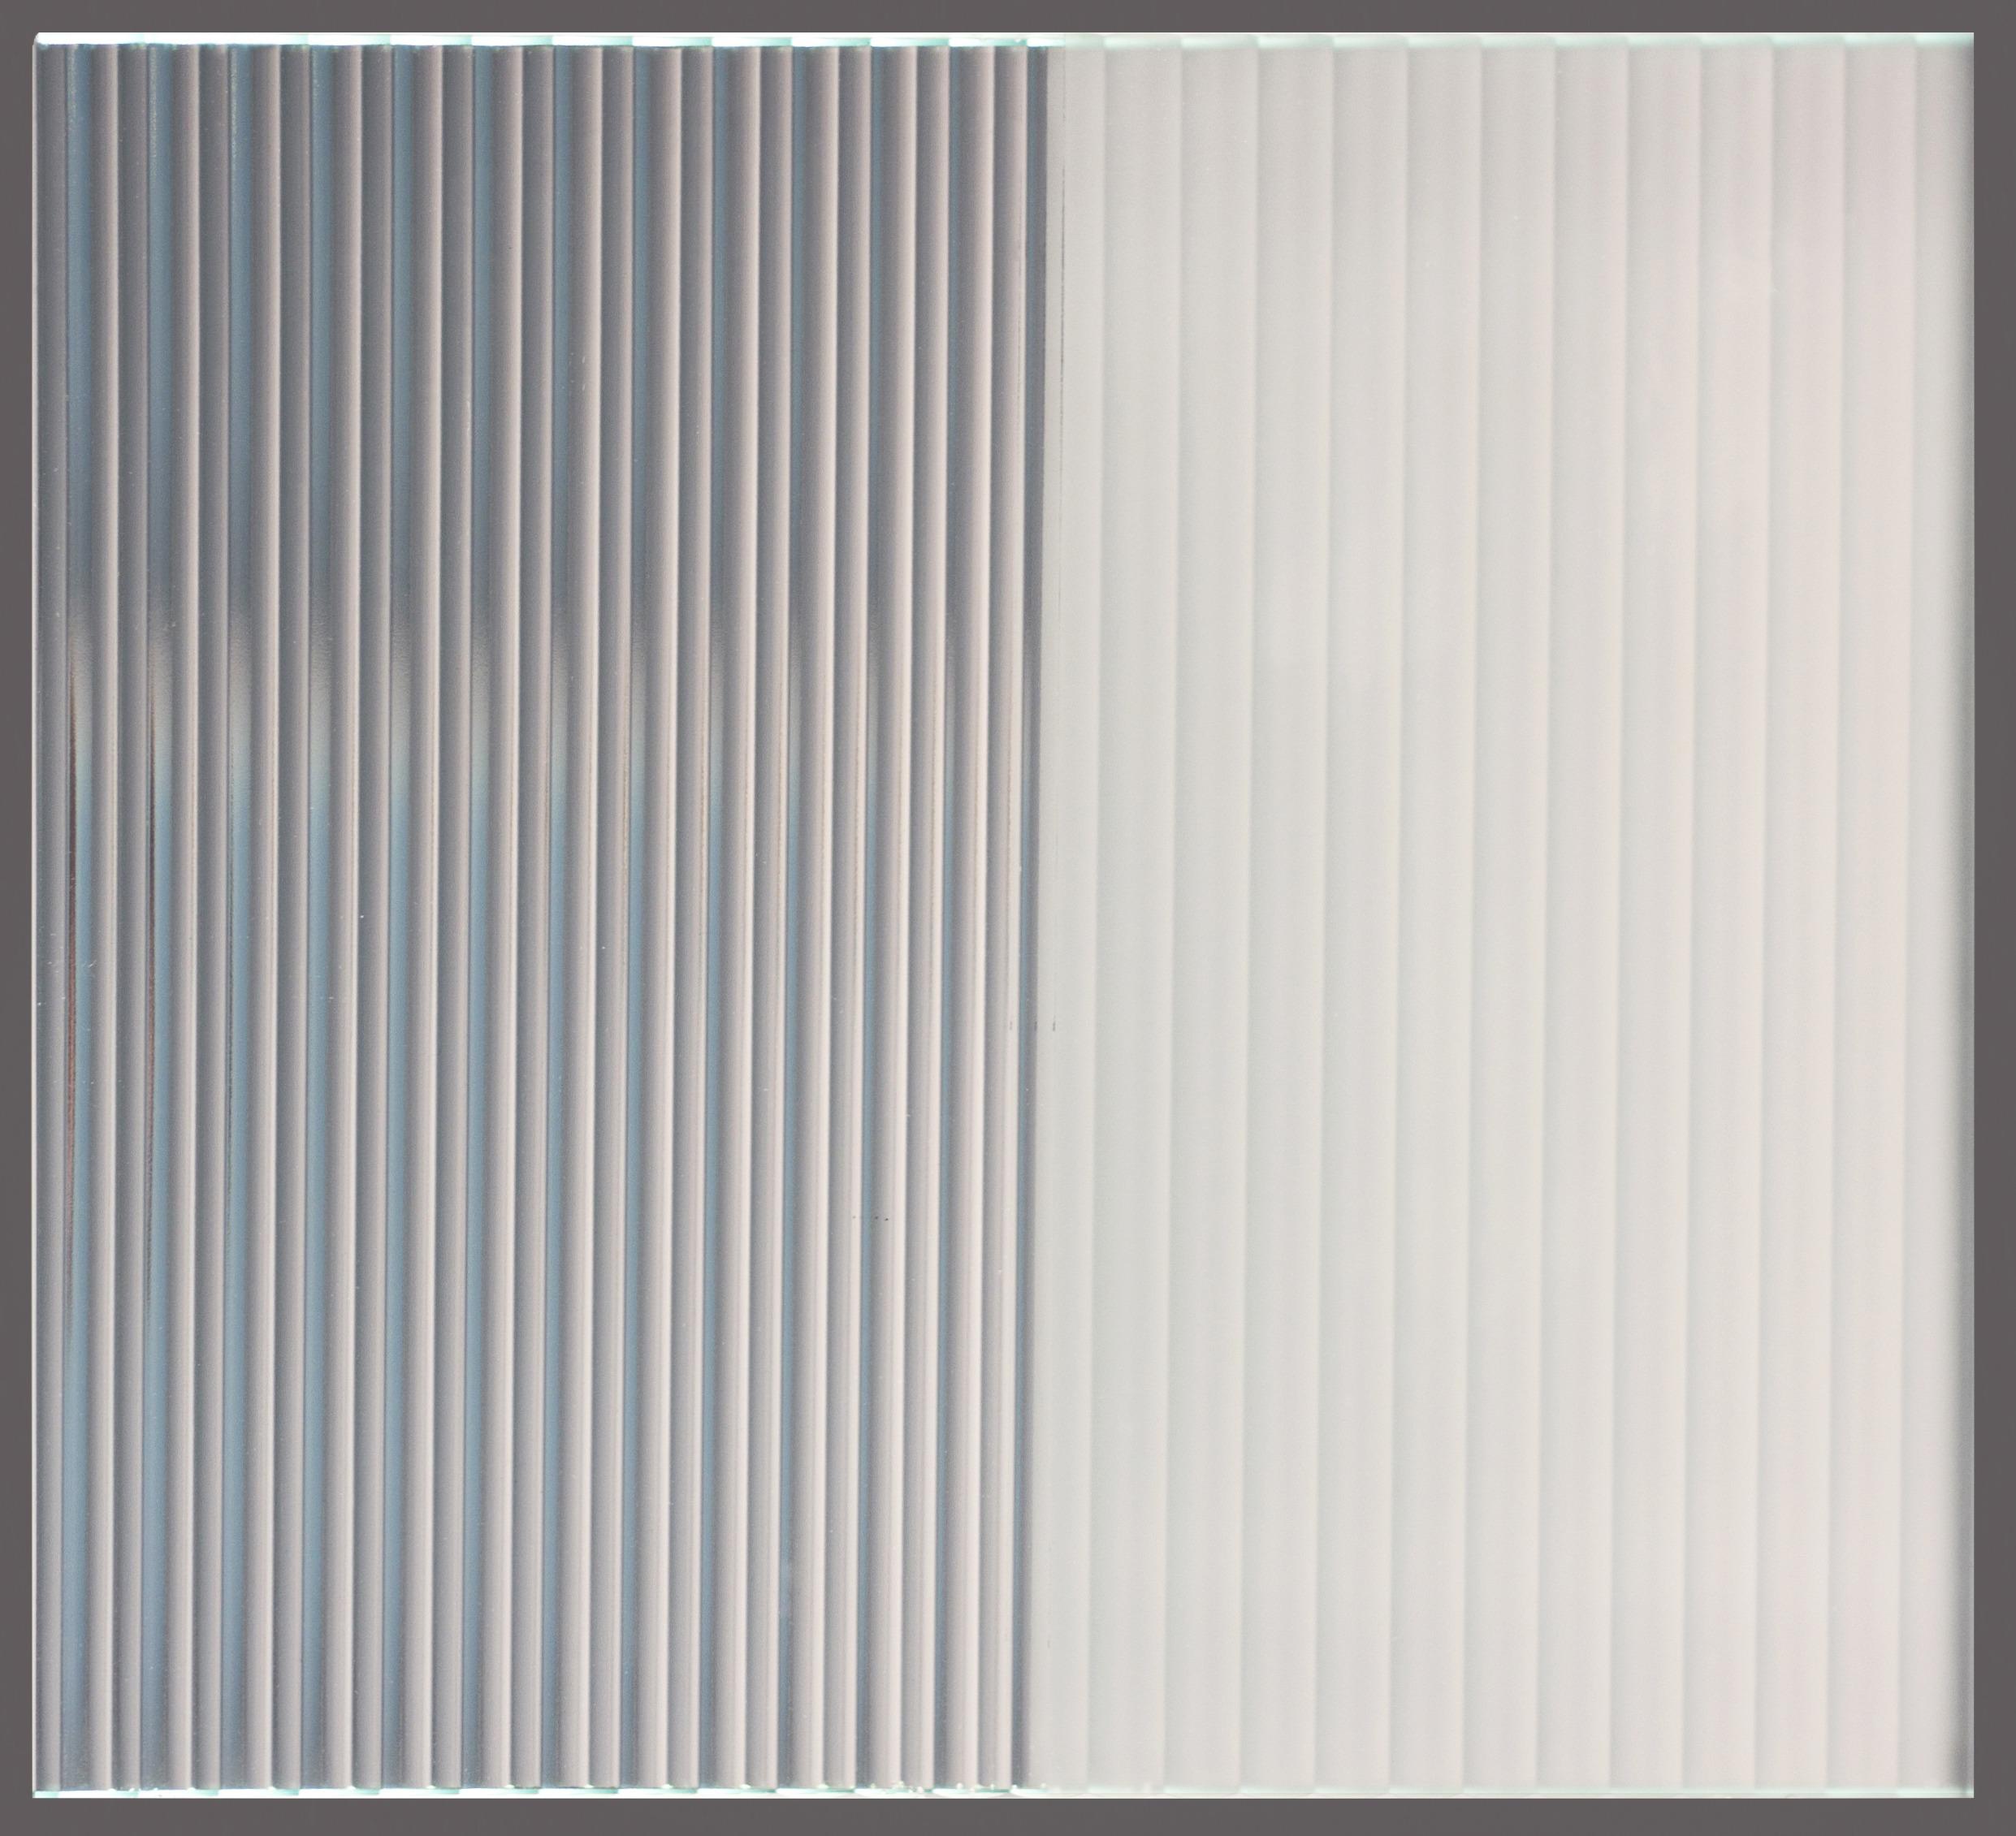 Daedalian Glass Studios Mirrored Reeded Half Etched Sample